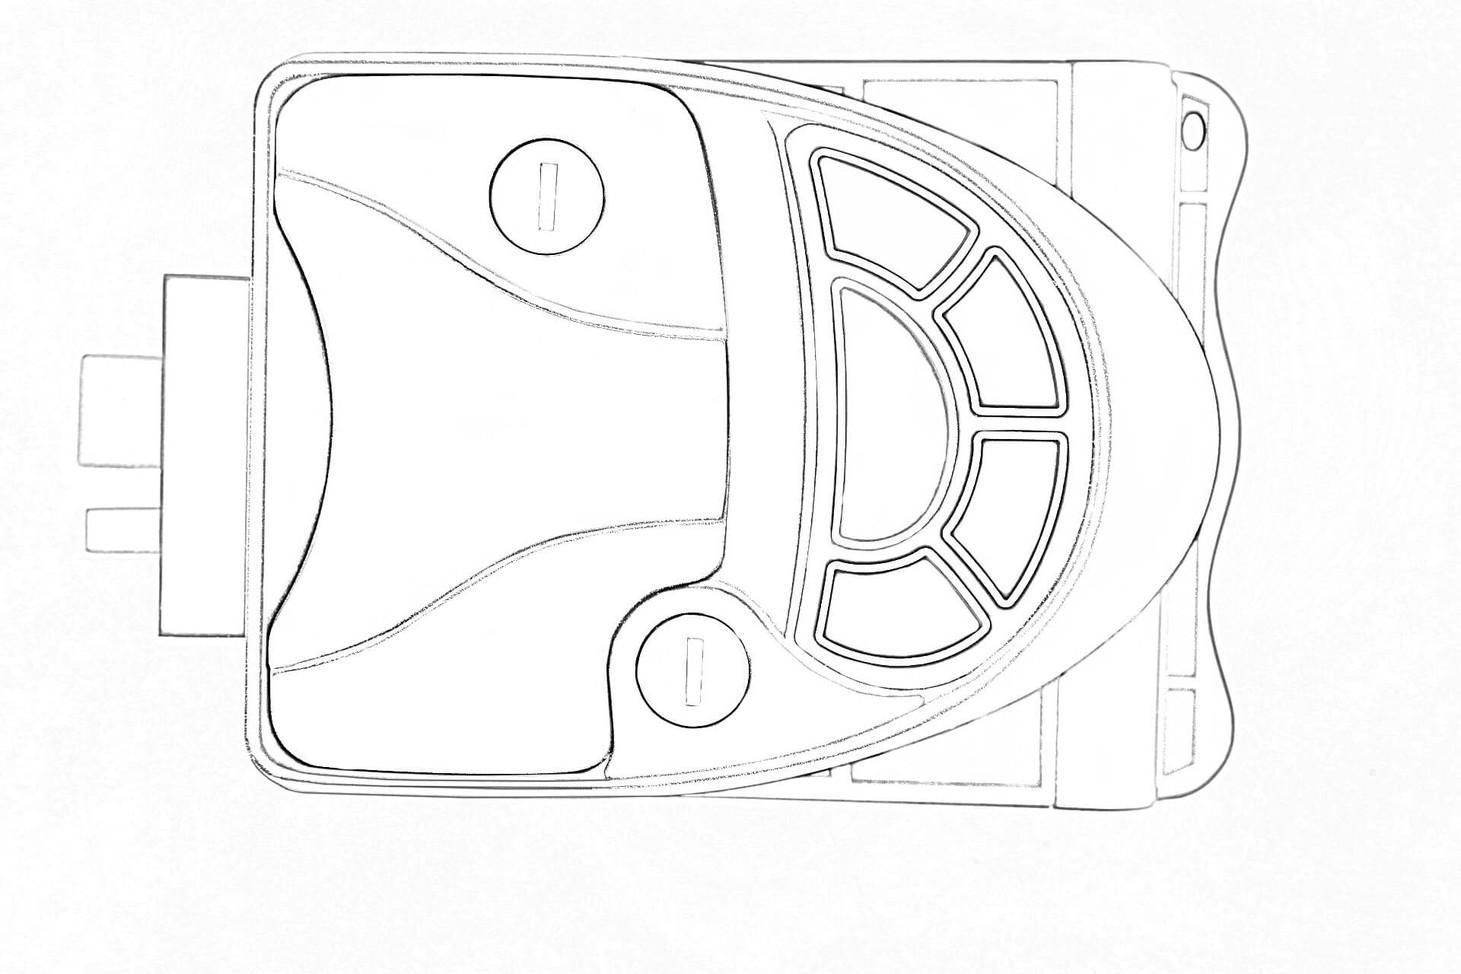 2--Illustration-Drawing-of-Carmtek-RV-Do